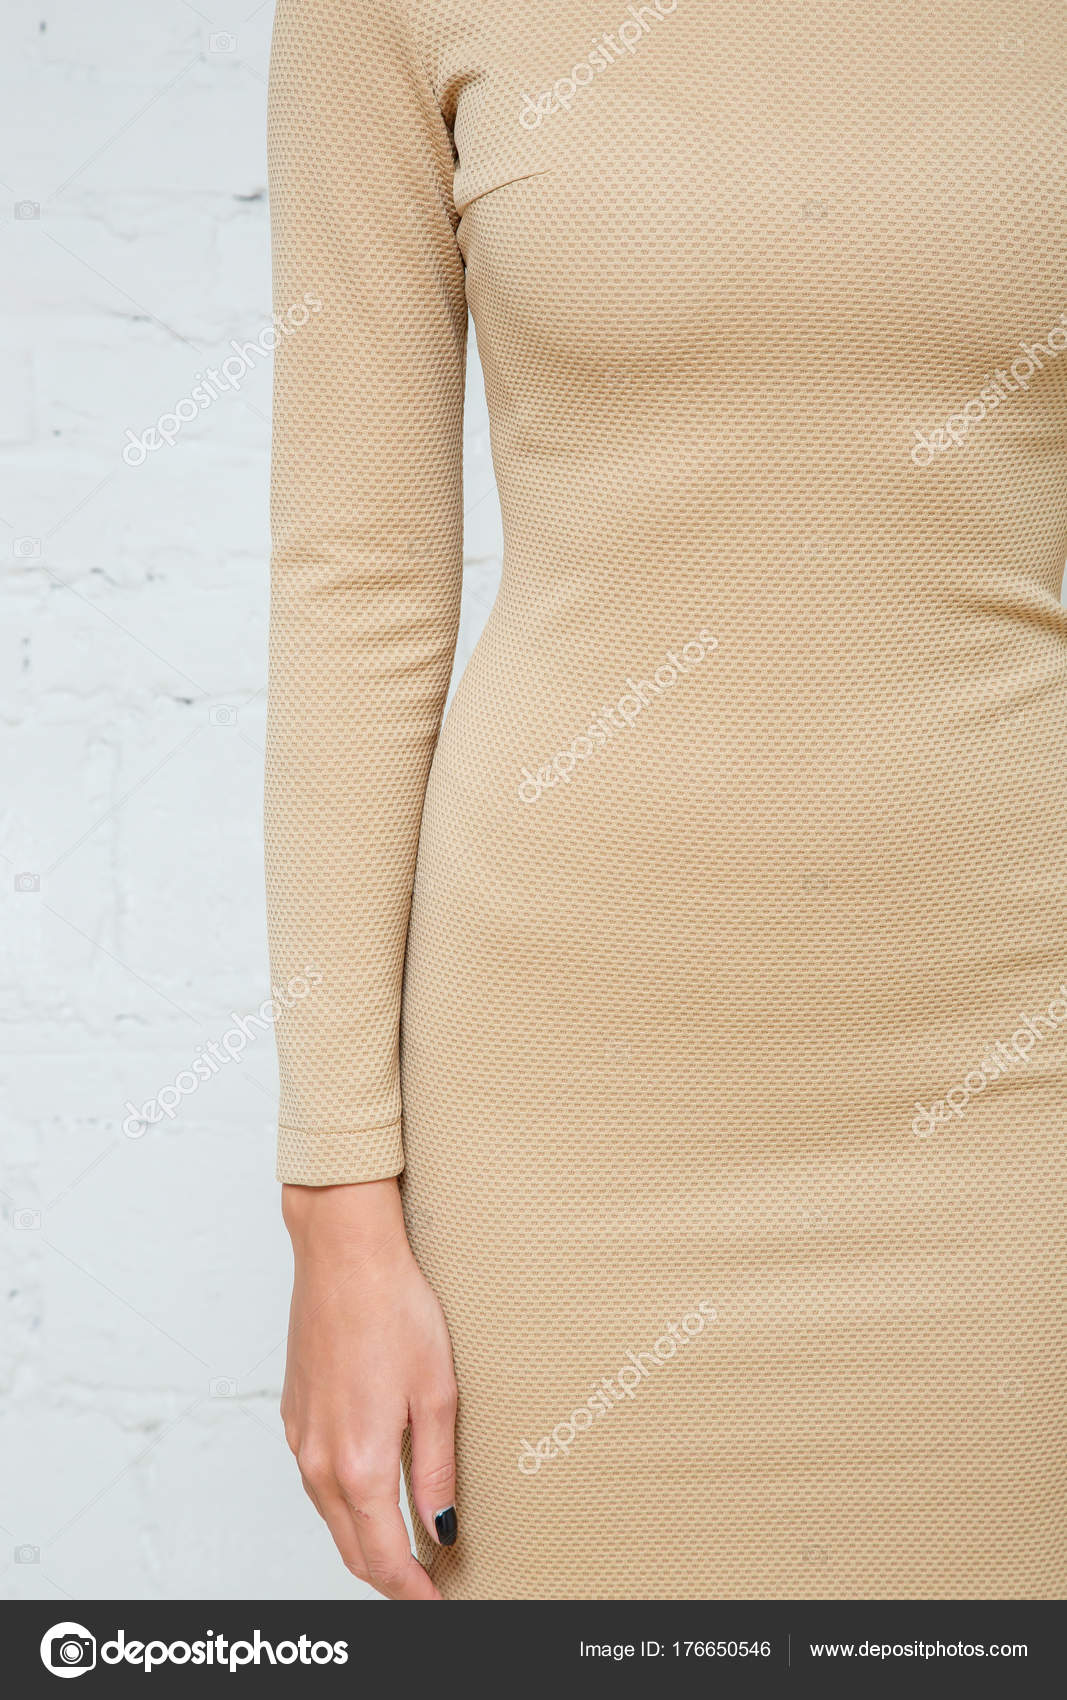 cd22340da73b Λεπτομέρειες για την γυναικεία ένδυση. Φόρεμα σε ένα μοντέλο σε λευκό φόντο  — Φωτογραφία Αρχείου